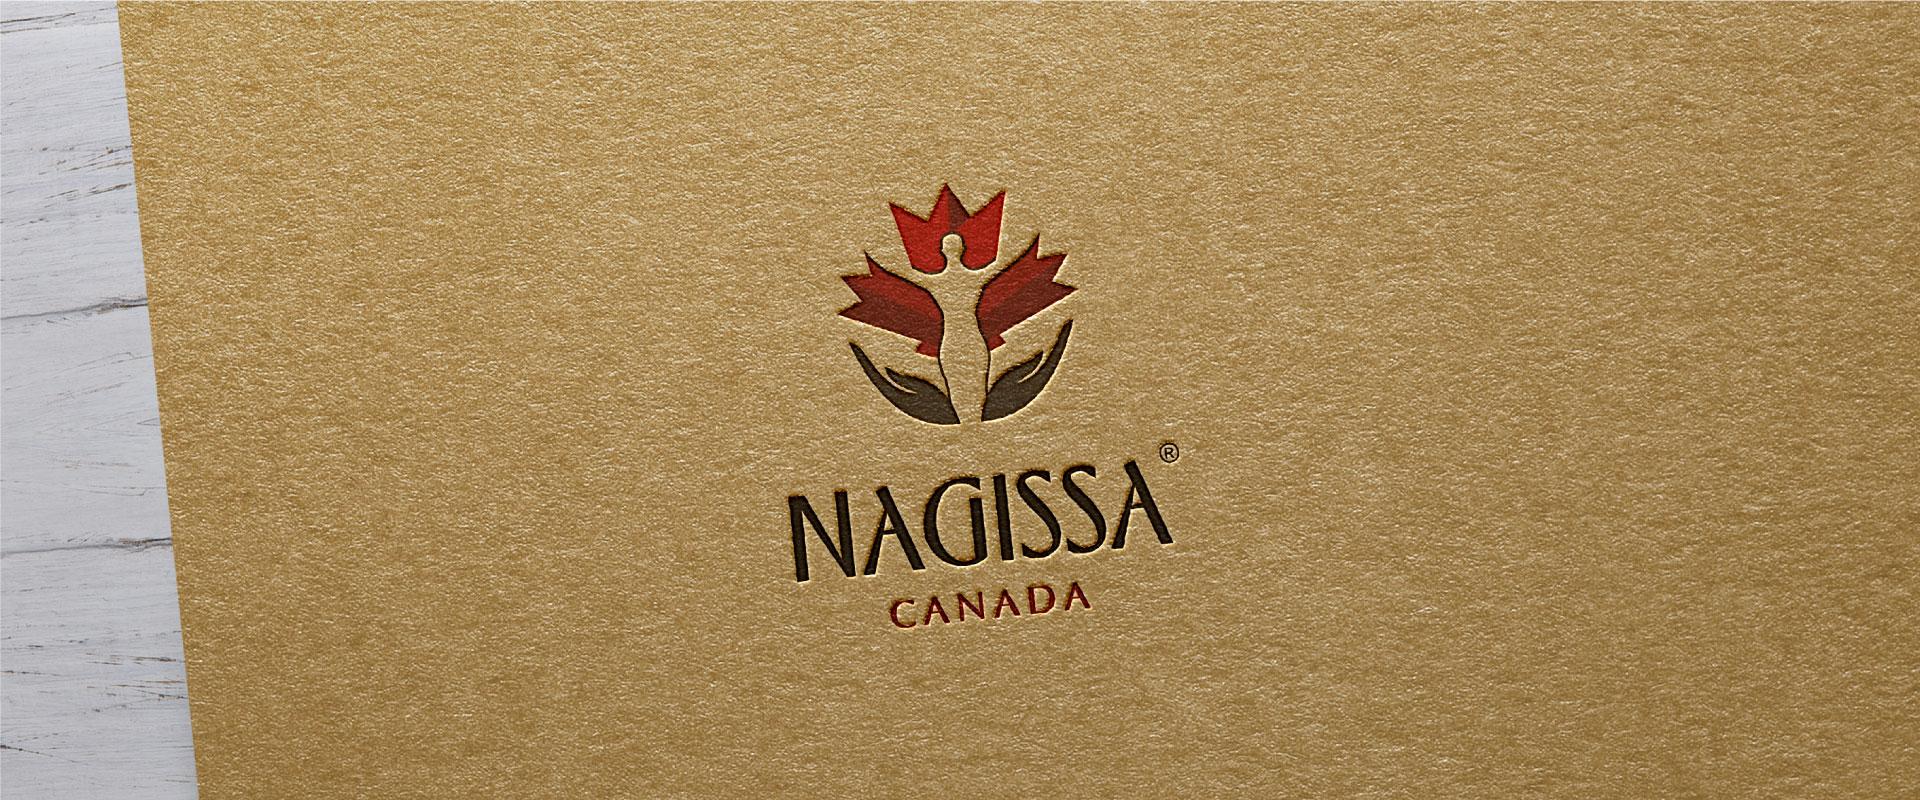 nagissa-canada-brand-logo-design-by-mapleweb-vancouver-canada-logo-on-paper-card-mock